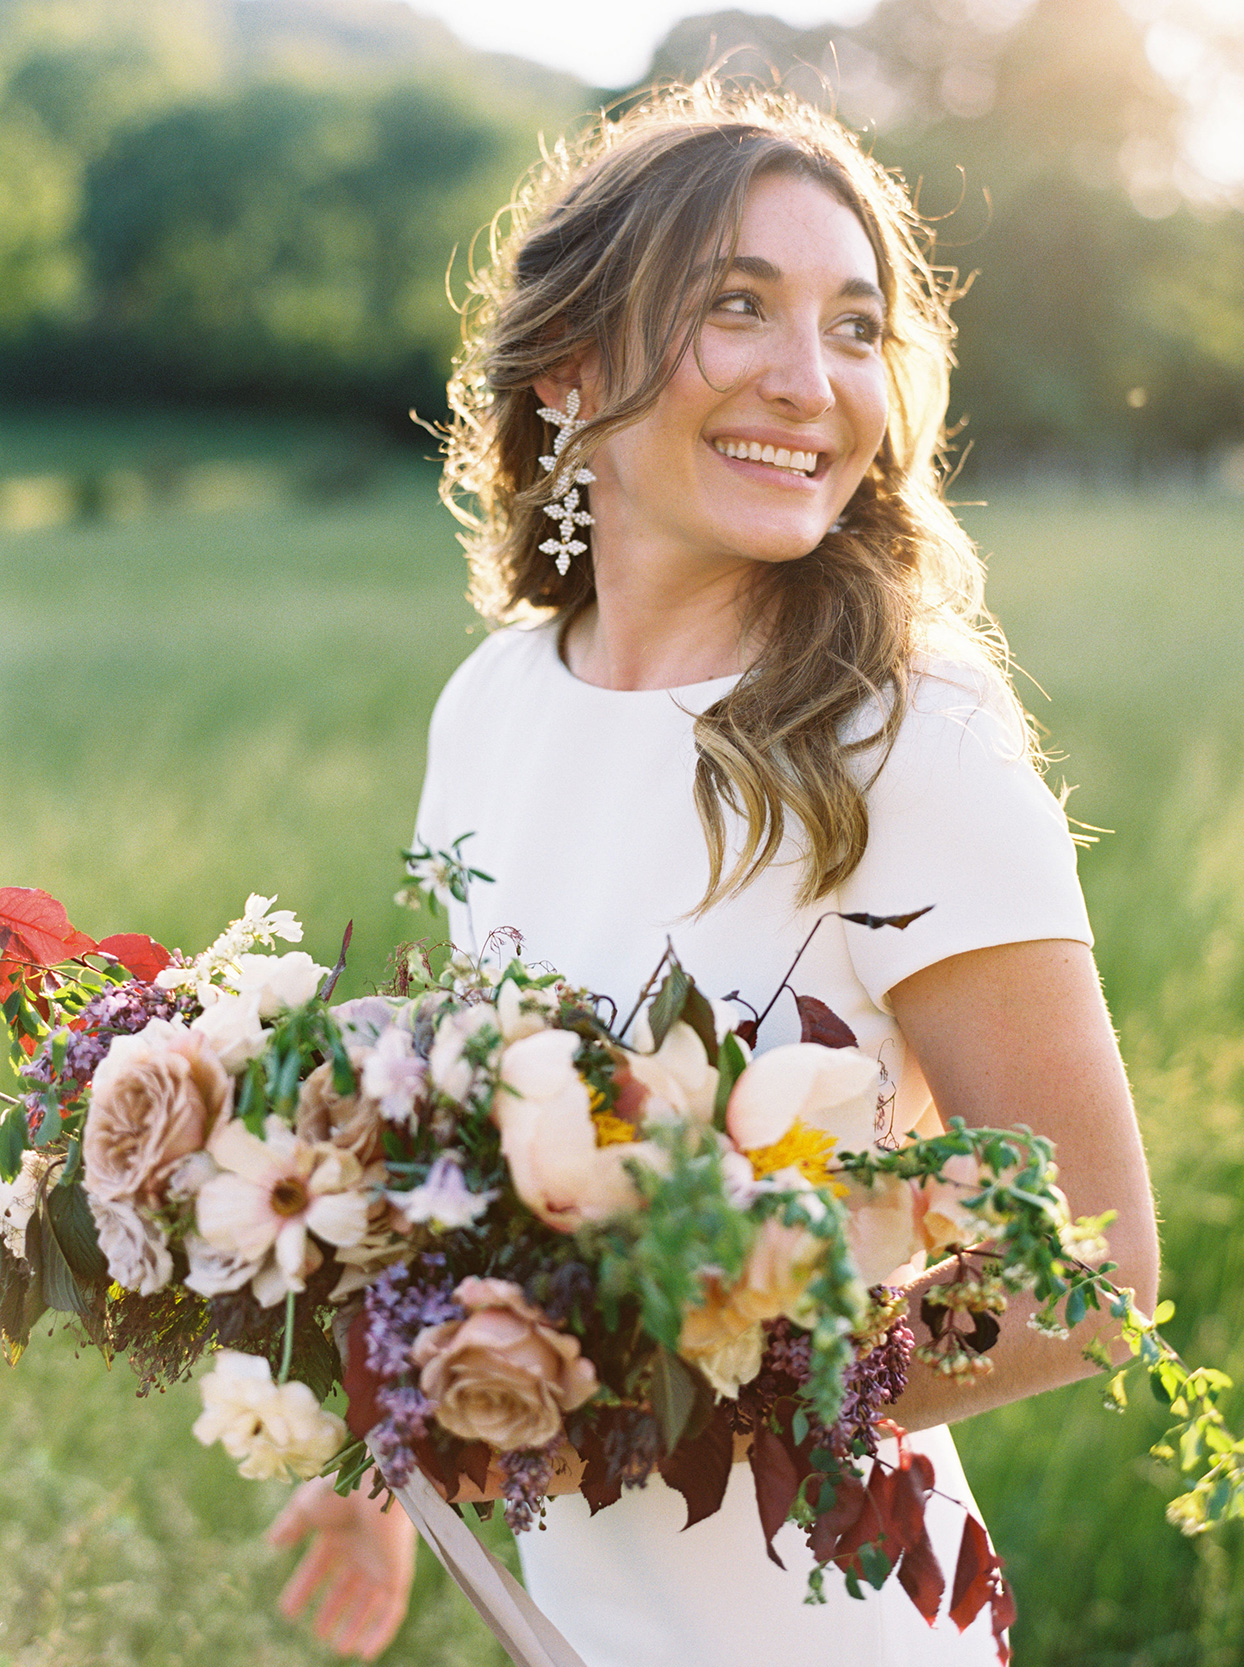 julia doug bride holding wedding bouquet